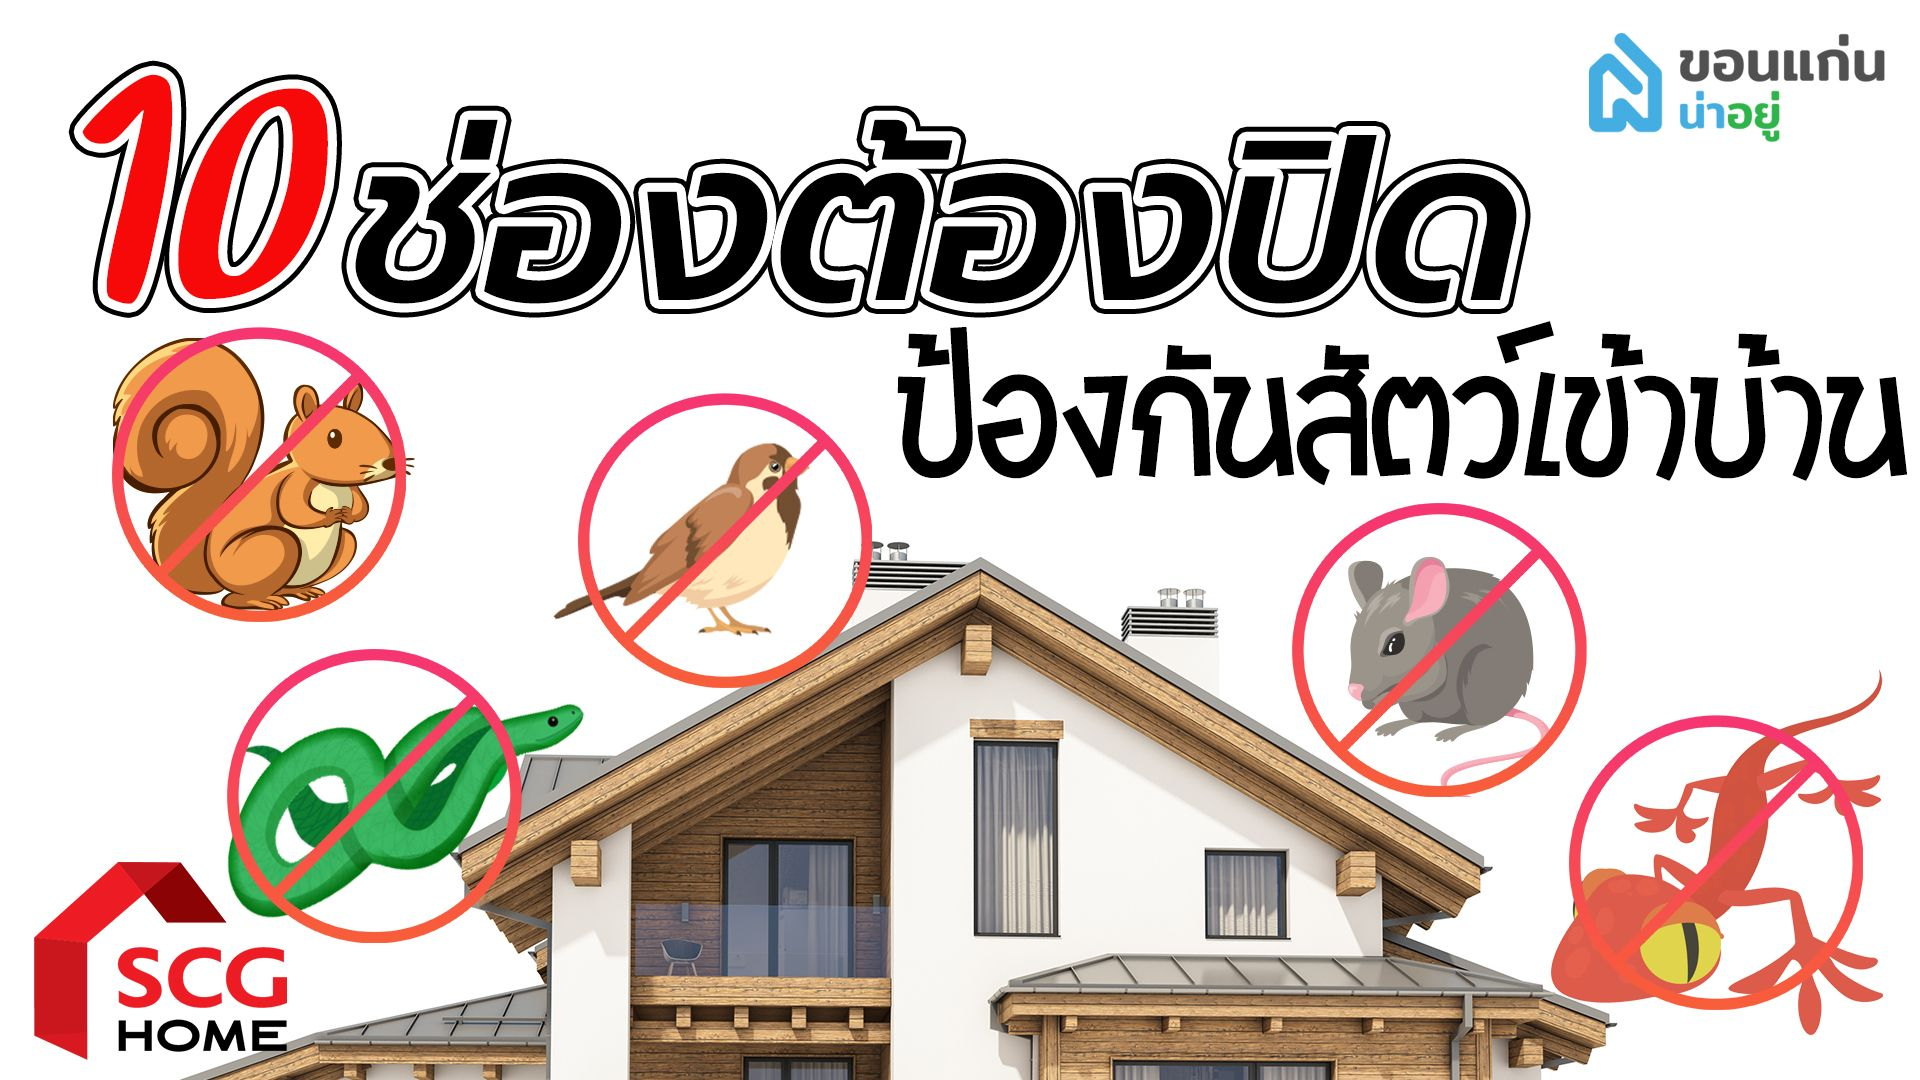 SCG Home : 10 ช่องต้องปิด! ต่อเติมตรงไหนบ้างเพื่อป้องกันสัตว์เข้าบ้าน